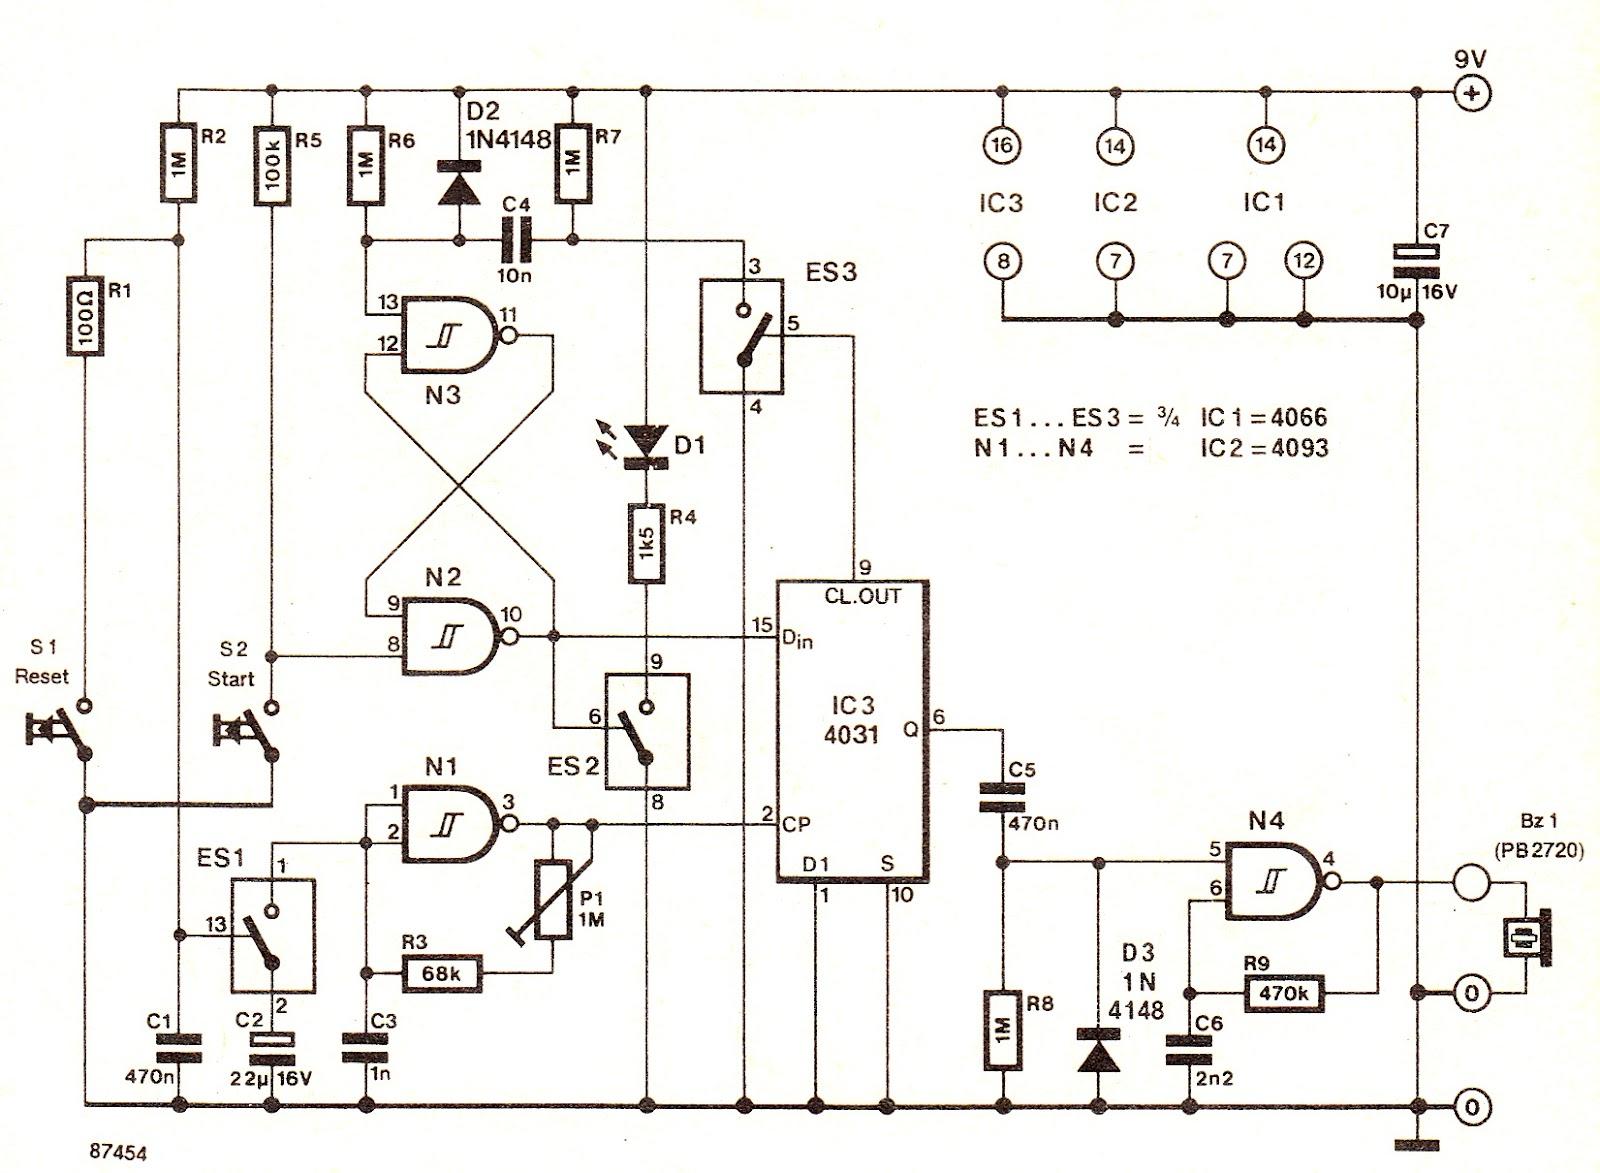 water geyser wiring diagram labeled phase change circuit schematic 39